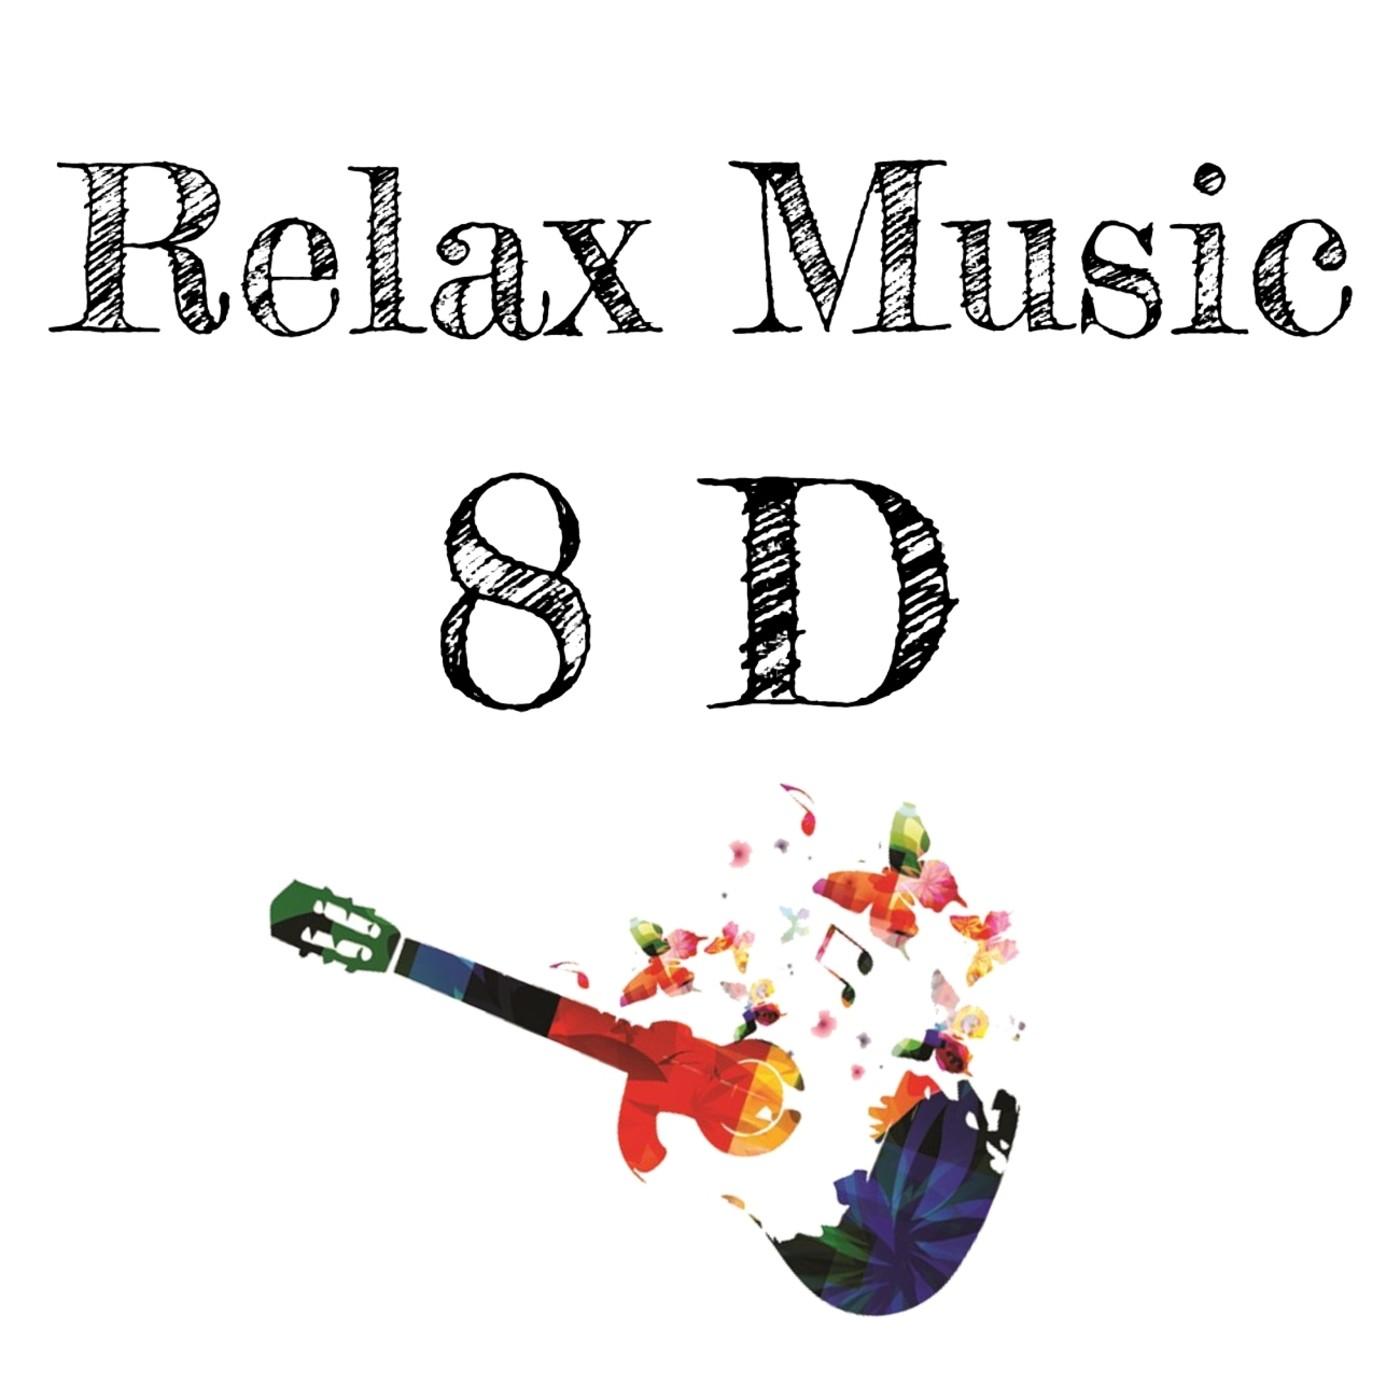 Musica Saxofón Relajante 8D - Musica instrumental relajante